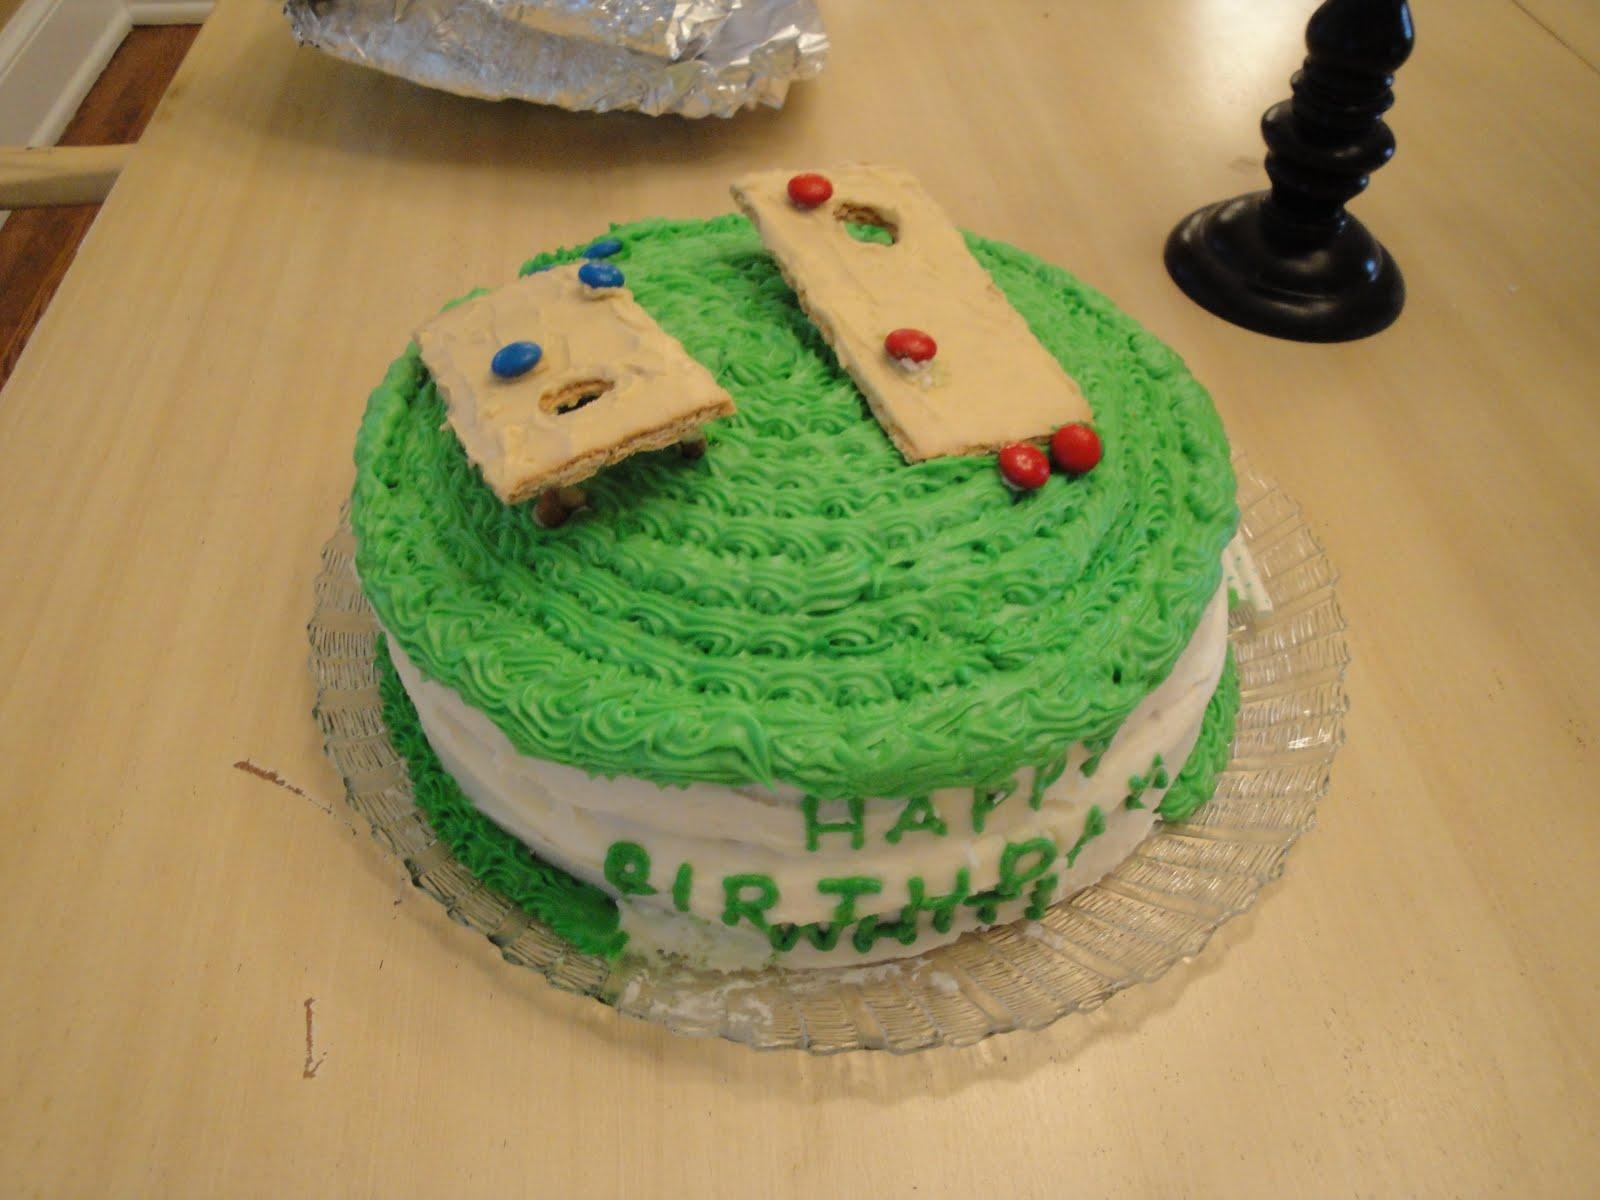 Honeydew You Love Me Cornhole In One Cake